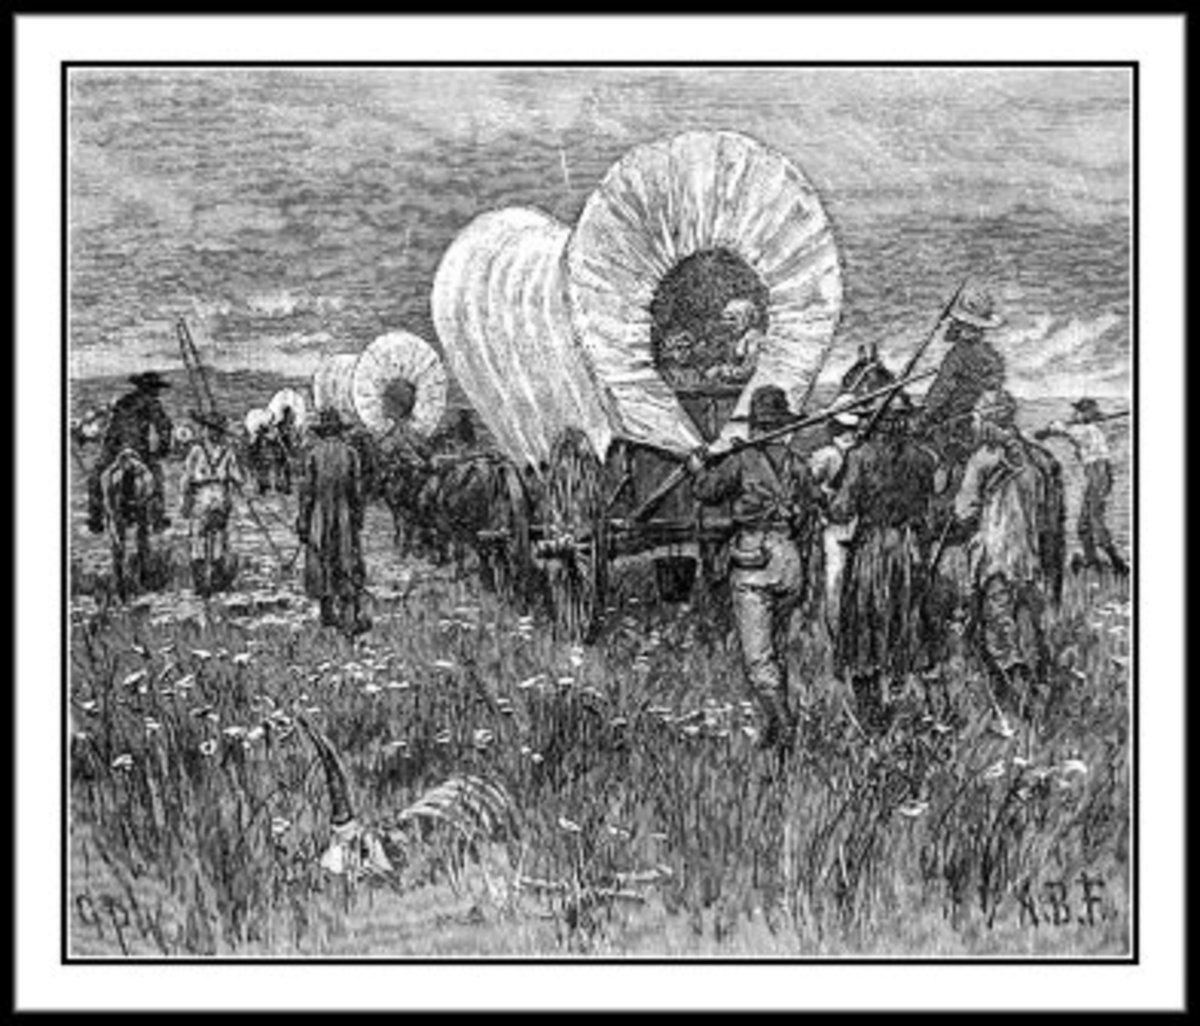 tale-of-the-mountain-meadows-massacre